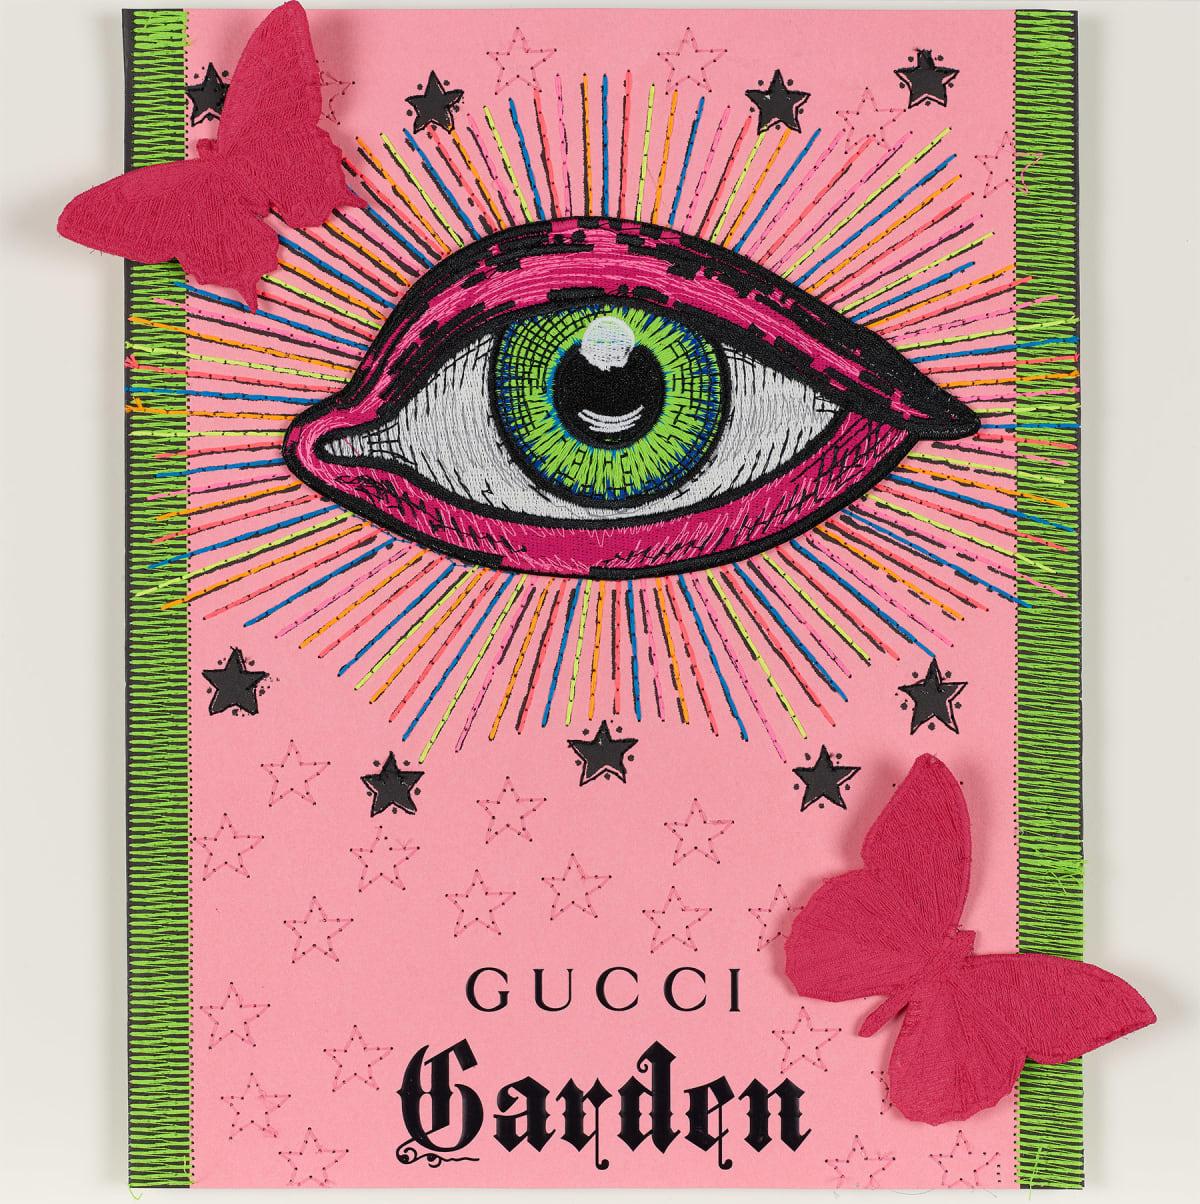 Stephen Wilson, Gucci Neon Garden II, 2020